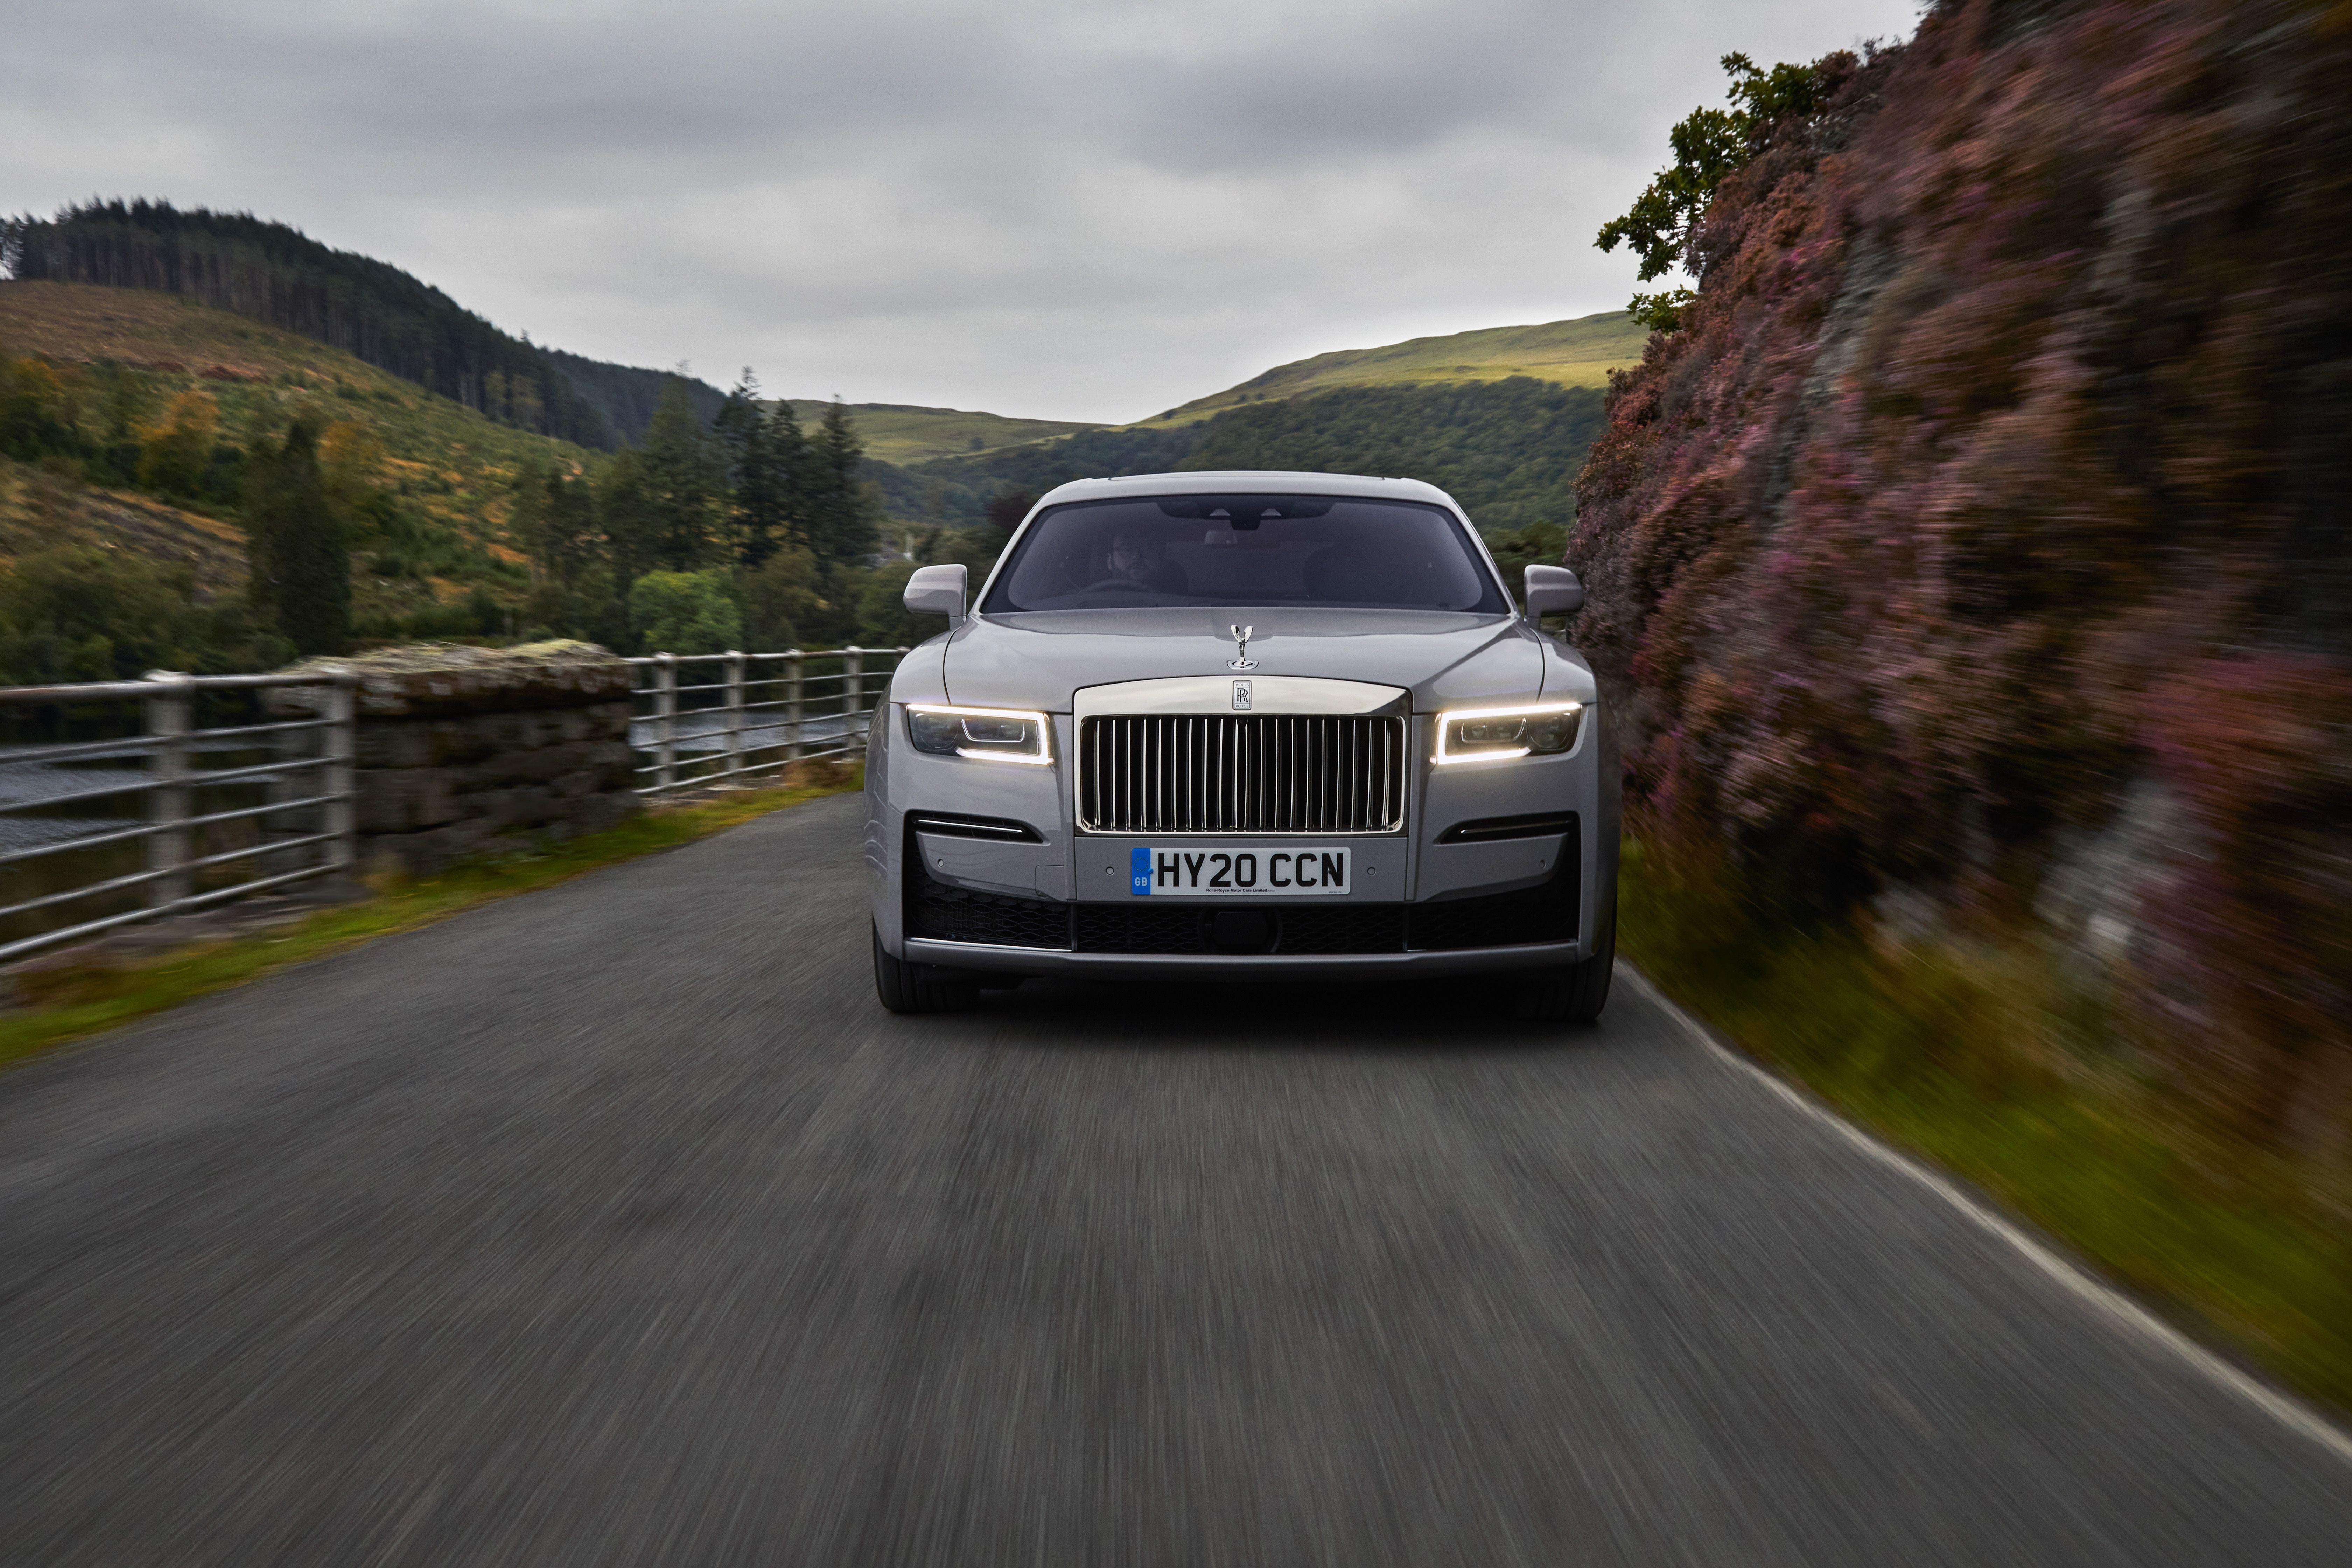 2021 Rolls Royce Ghost Marks An Opulent Evolution